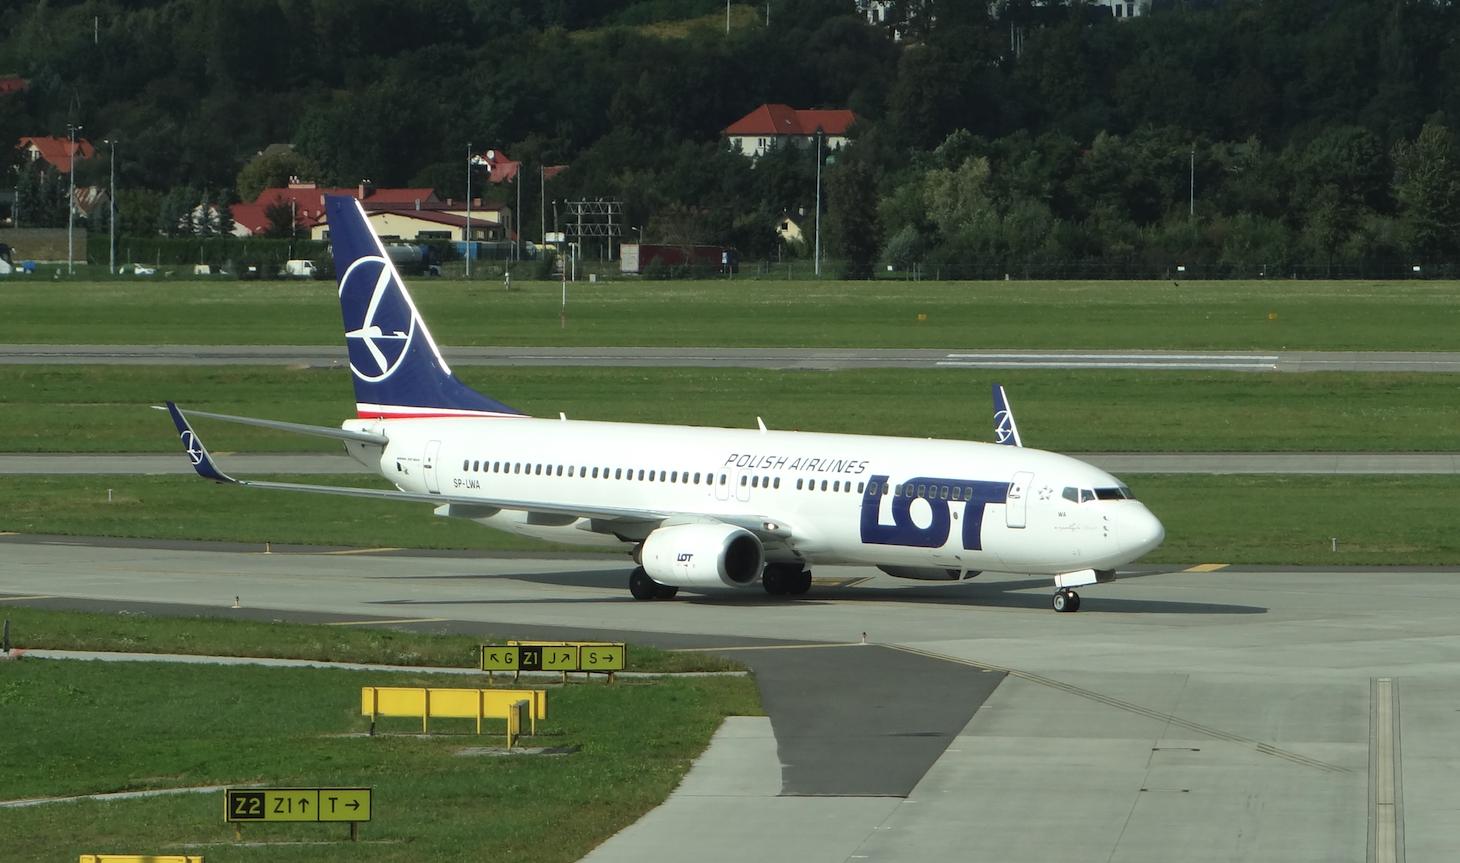 Boeing B-737-800, SP-LWA. 2019 year. Photo by Karol Placha Hetman